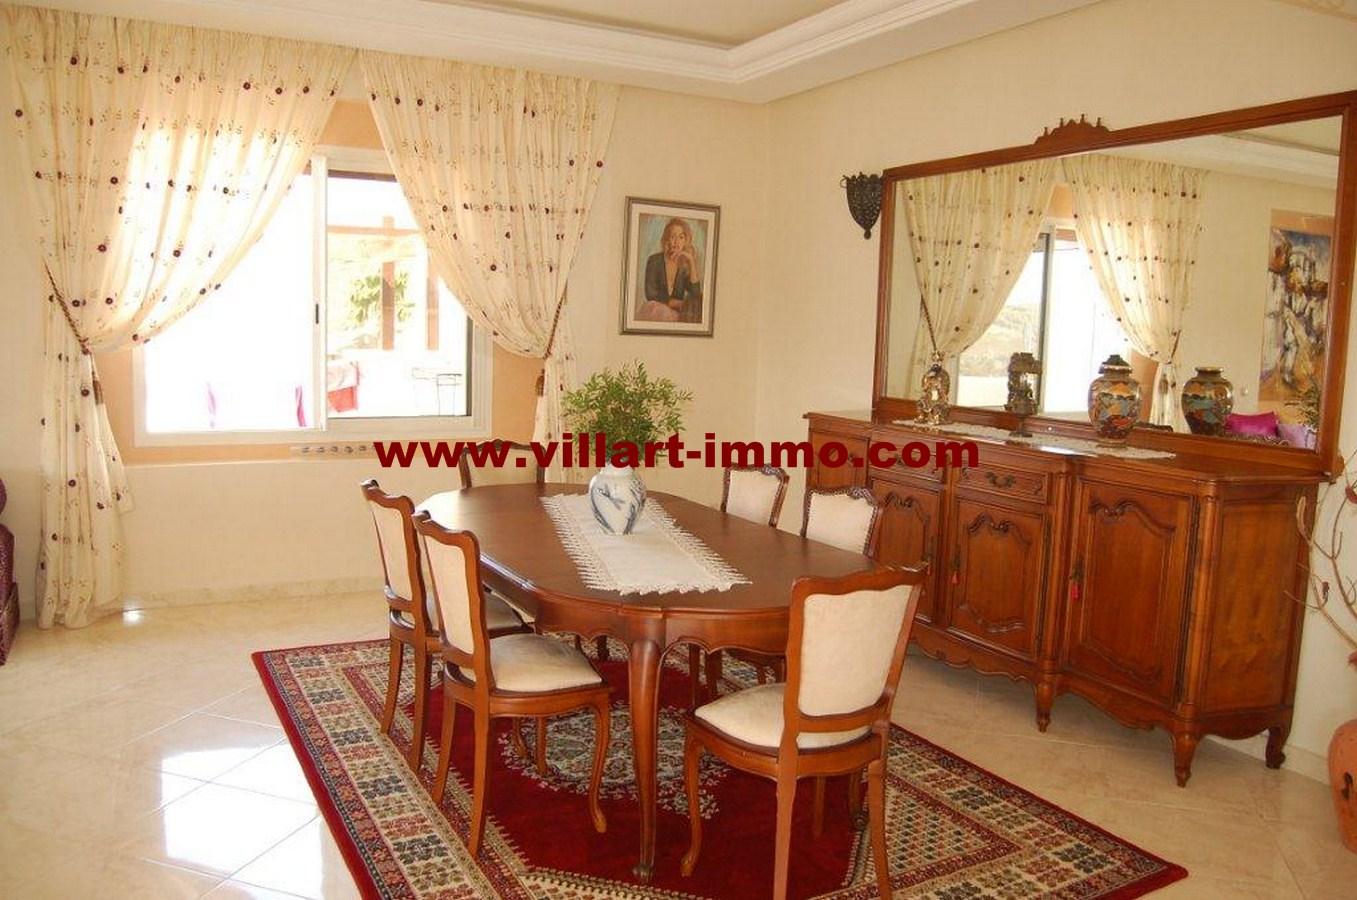 4-vente-appartement-tanger-la-montagne-salon-4-va452-villart-immo